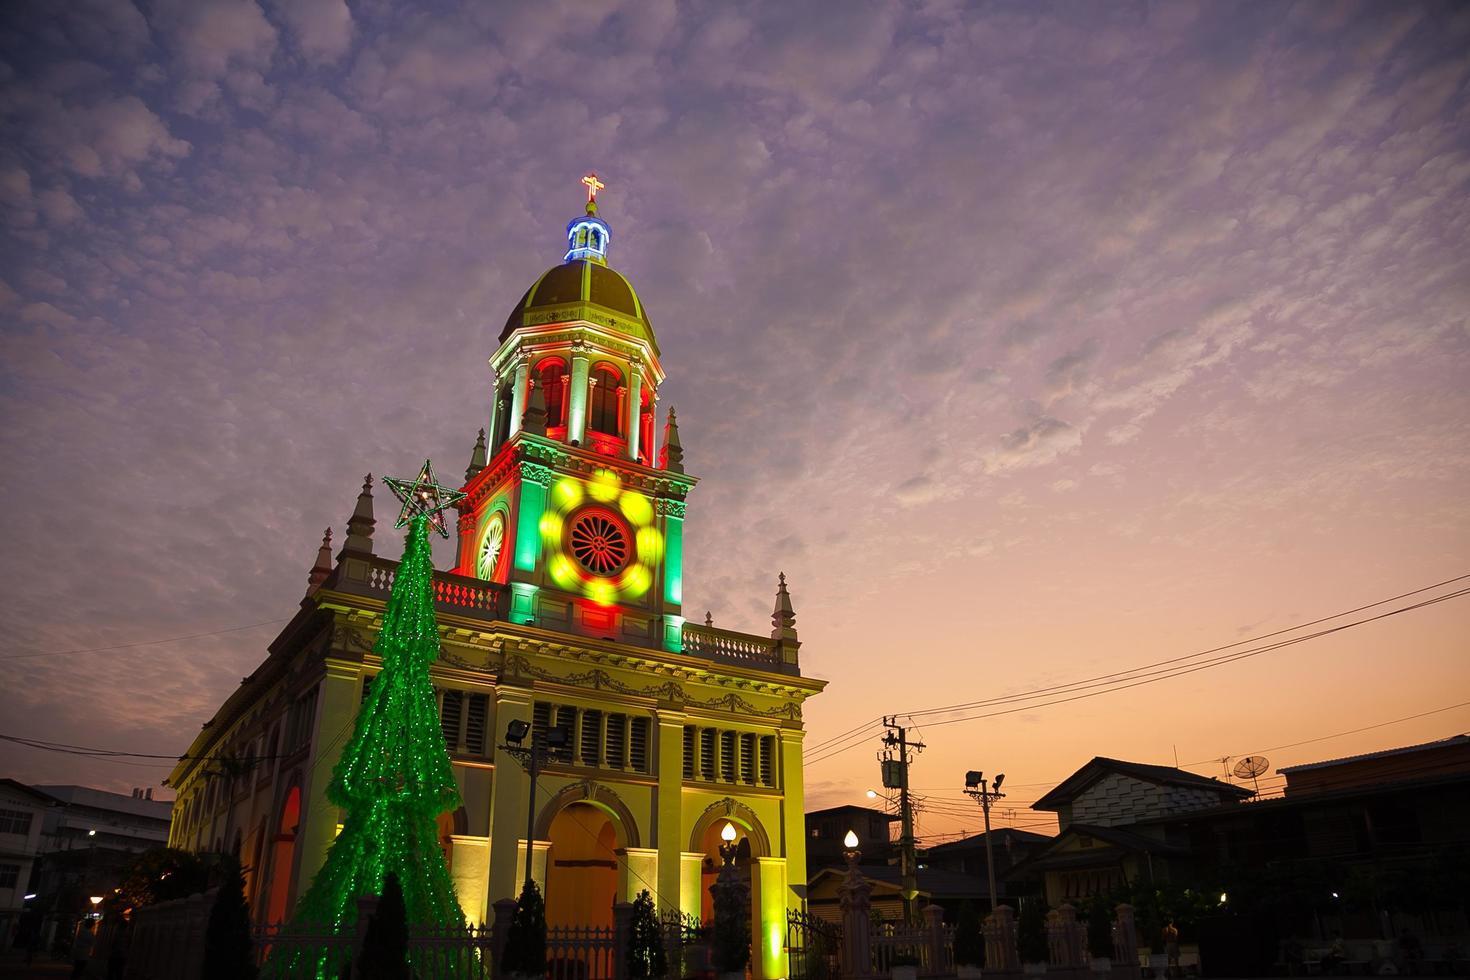 kerk van Christus met kerstversiering foto